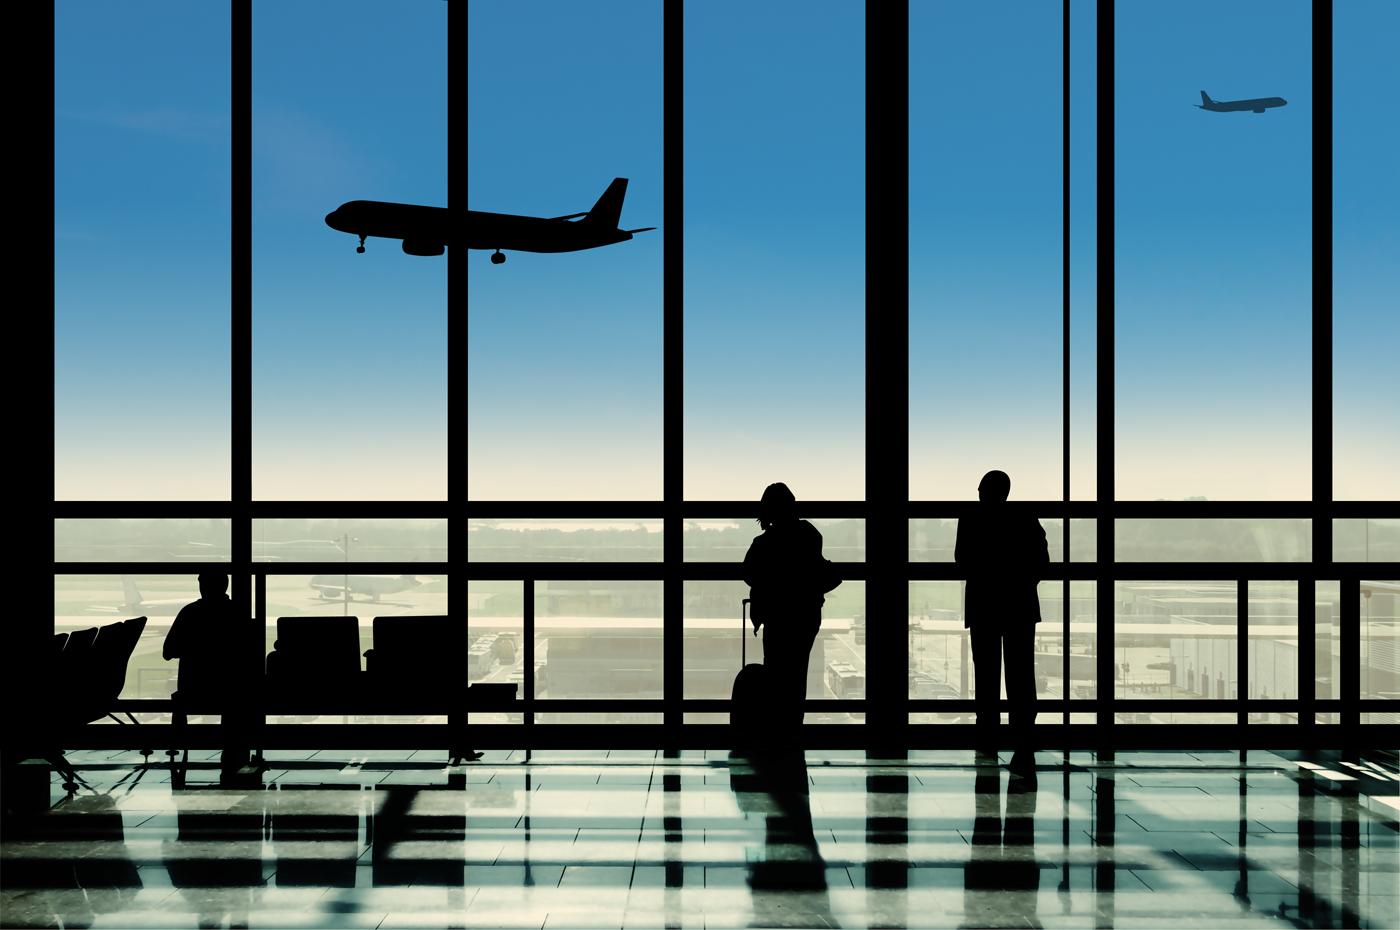 Airport-terminal